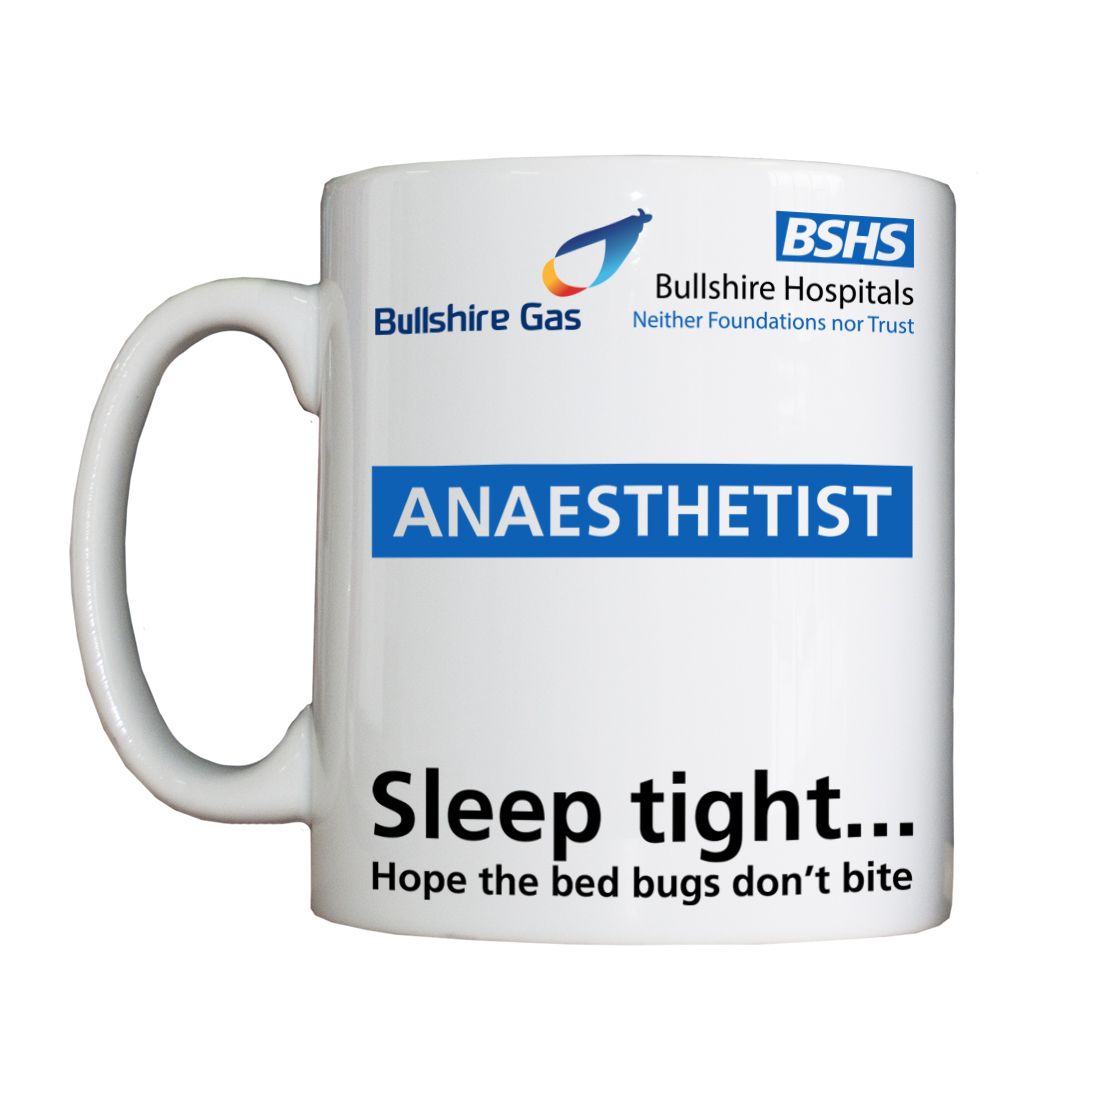 Personalised 'Bullshire Gas Anaesthetist' Drinking Vessel BSHSBullshireGasVessel